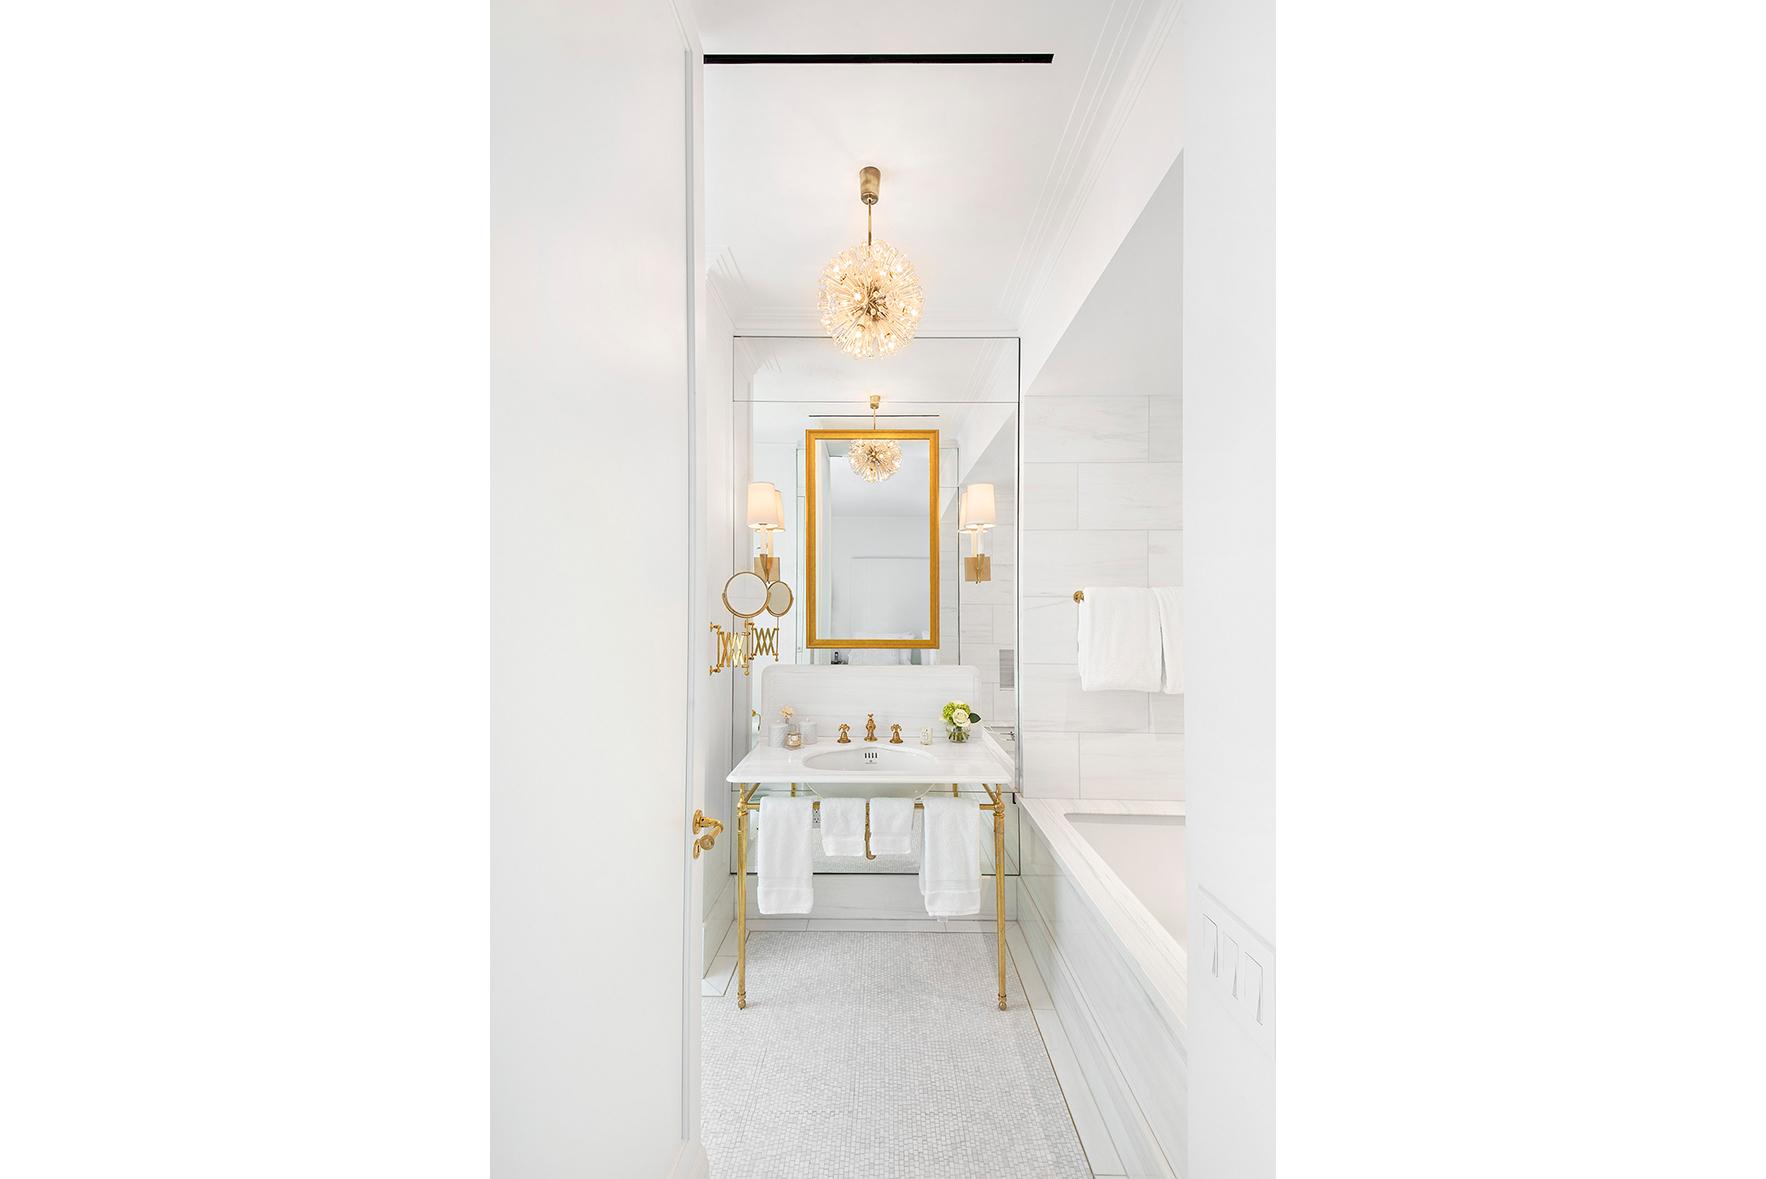 Apartment for sale at 211 Central Park West, Apt 2G